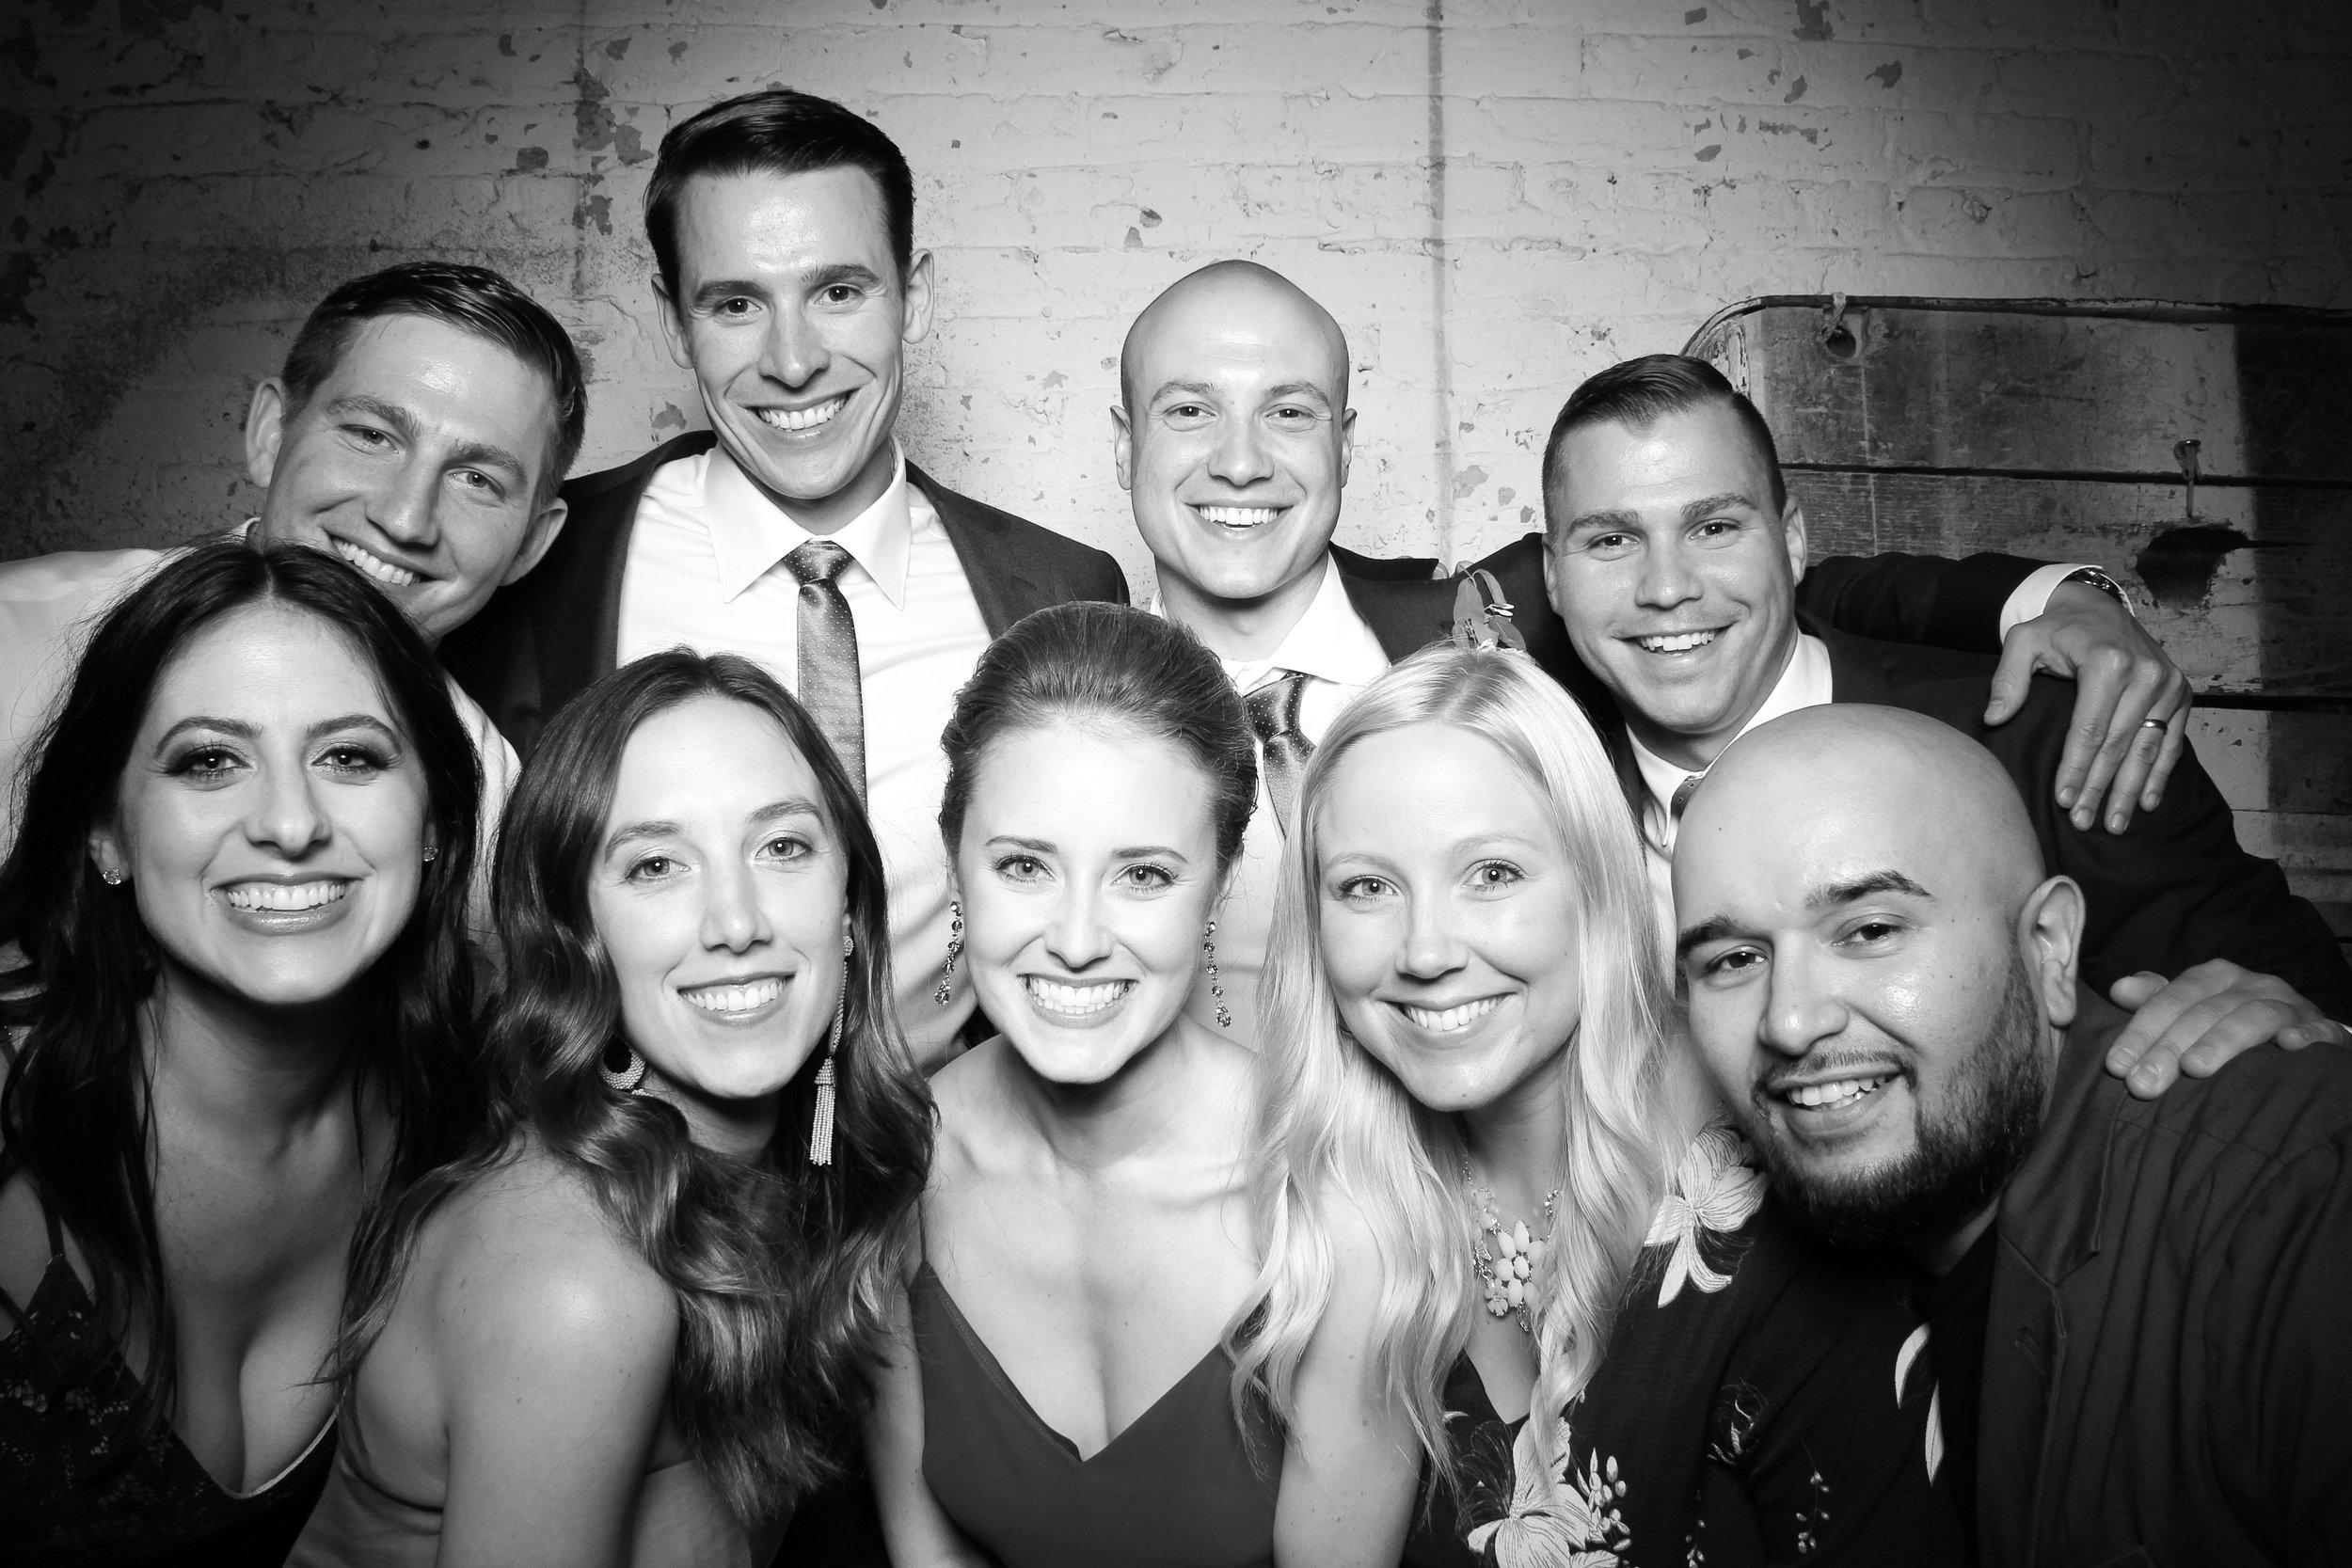 The_Joinery_Wedding_Venue_Logan_Square_Reception_10.jpg